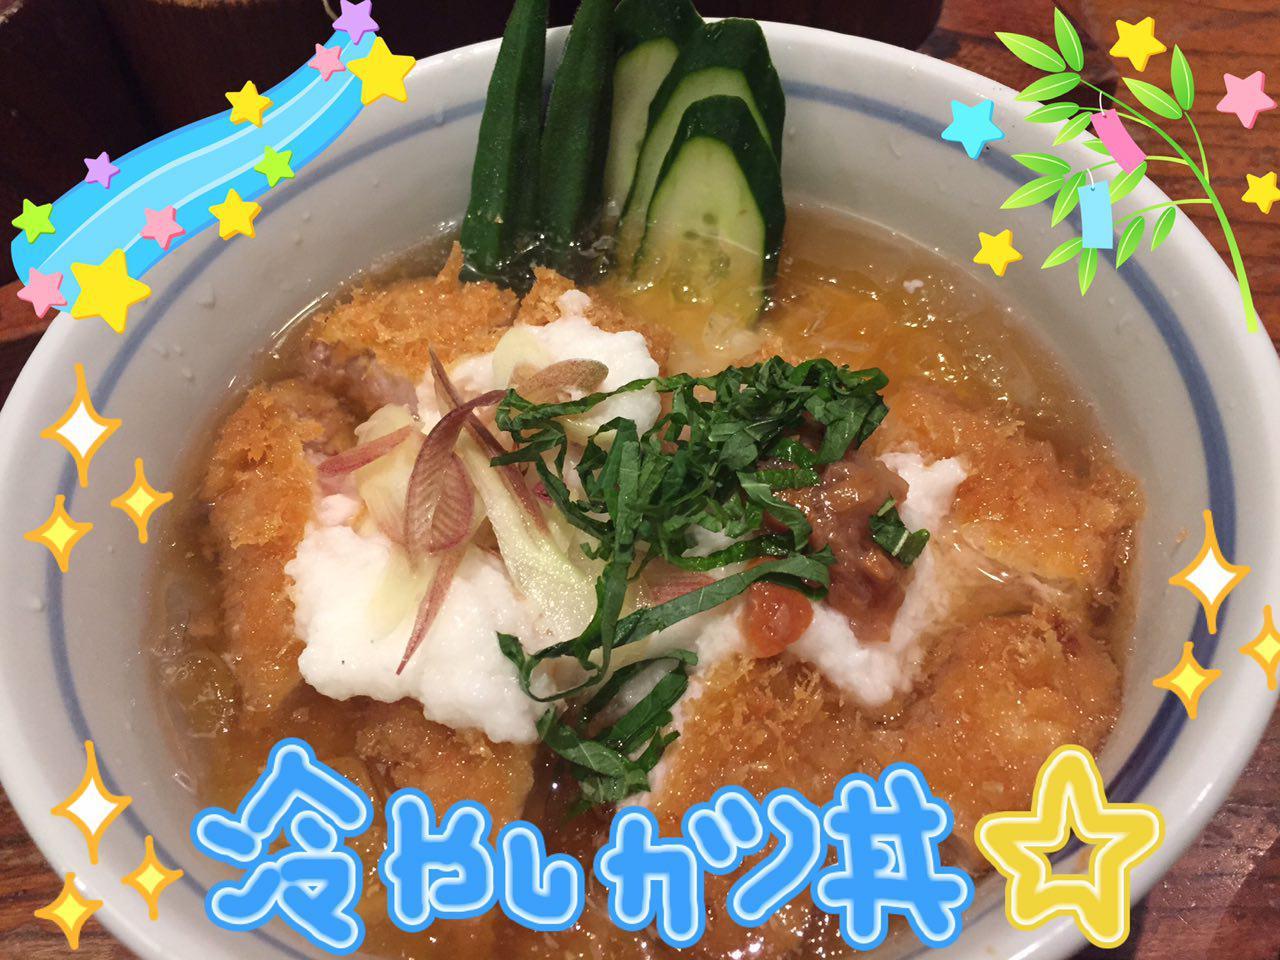 photo_2017-07-07_20-00-15.jpg